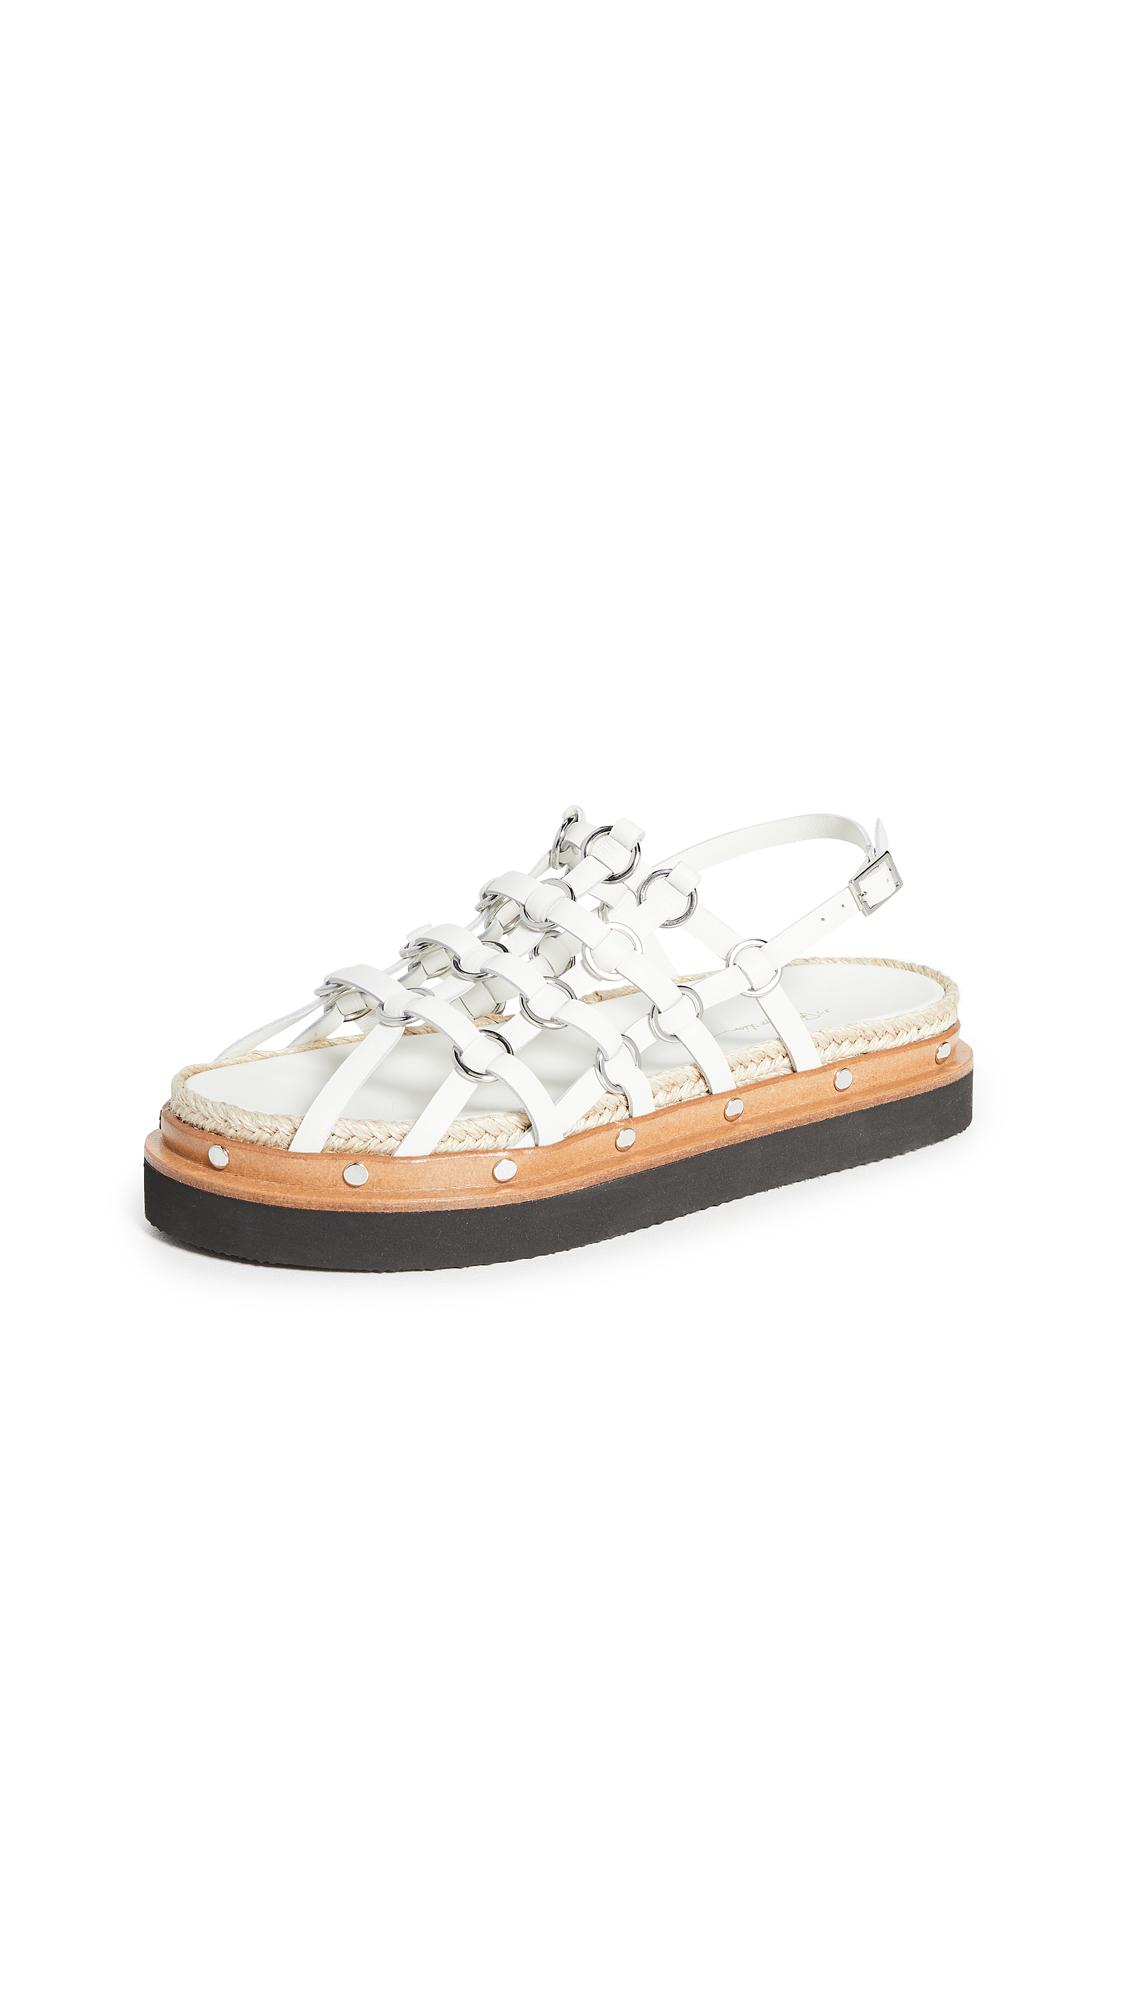 Buy 3.1 Phillip Lim Yasmine Cage Espadrille Platform Sandals online, shop 3.1 Phillip Lim